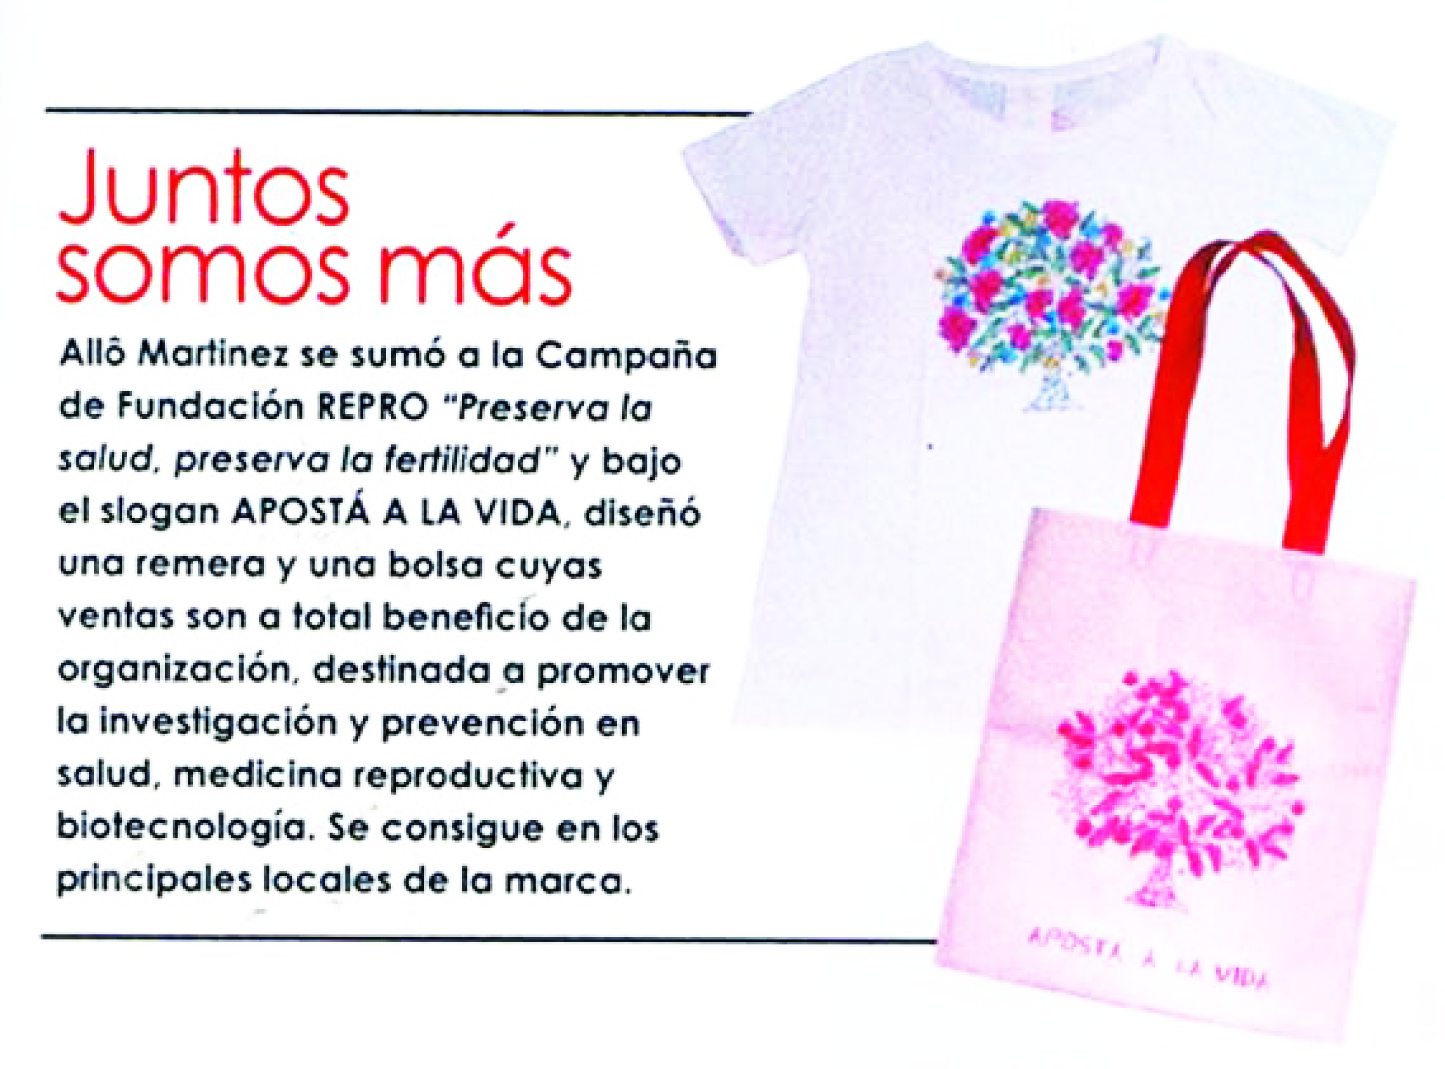 Halitus - Revista Vanidades 13.02